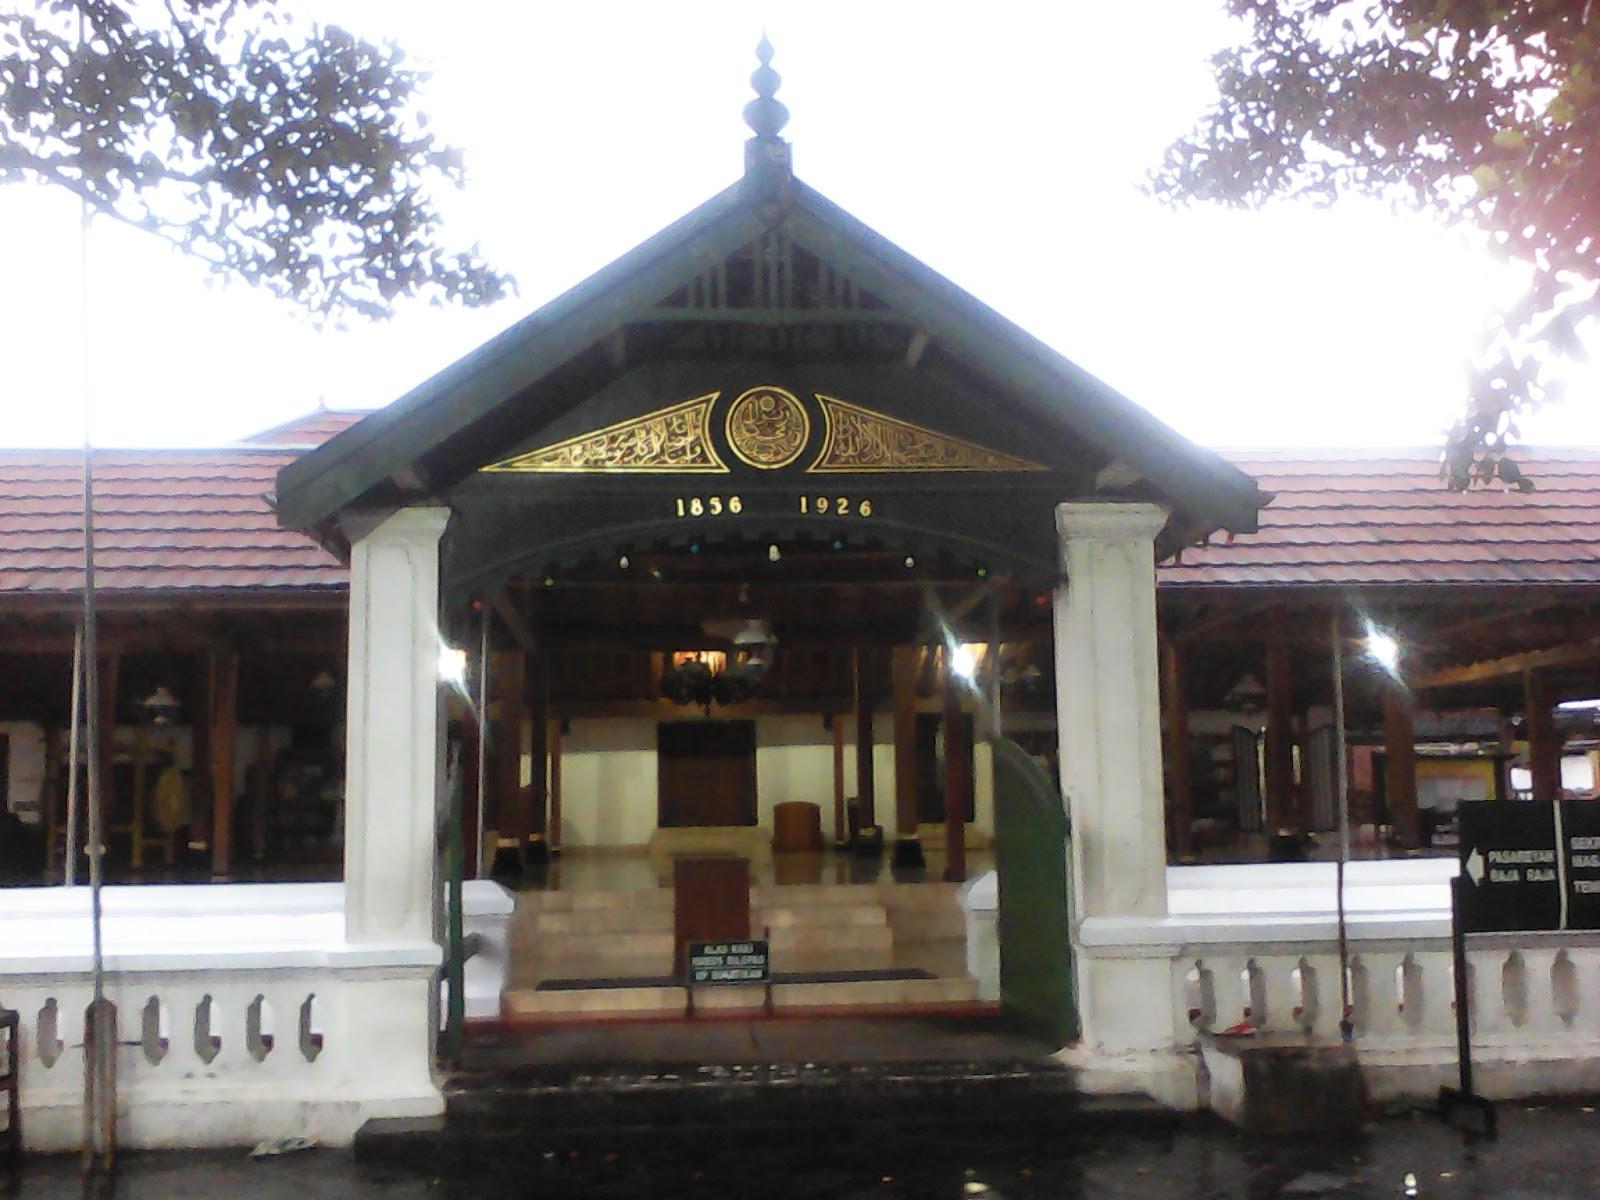 Wisata Budaya Kotagede Bangunan Masjid Terletak Sebelah Barat Alun Satu